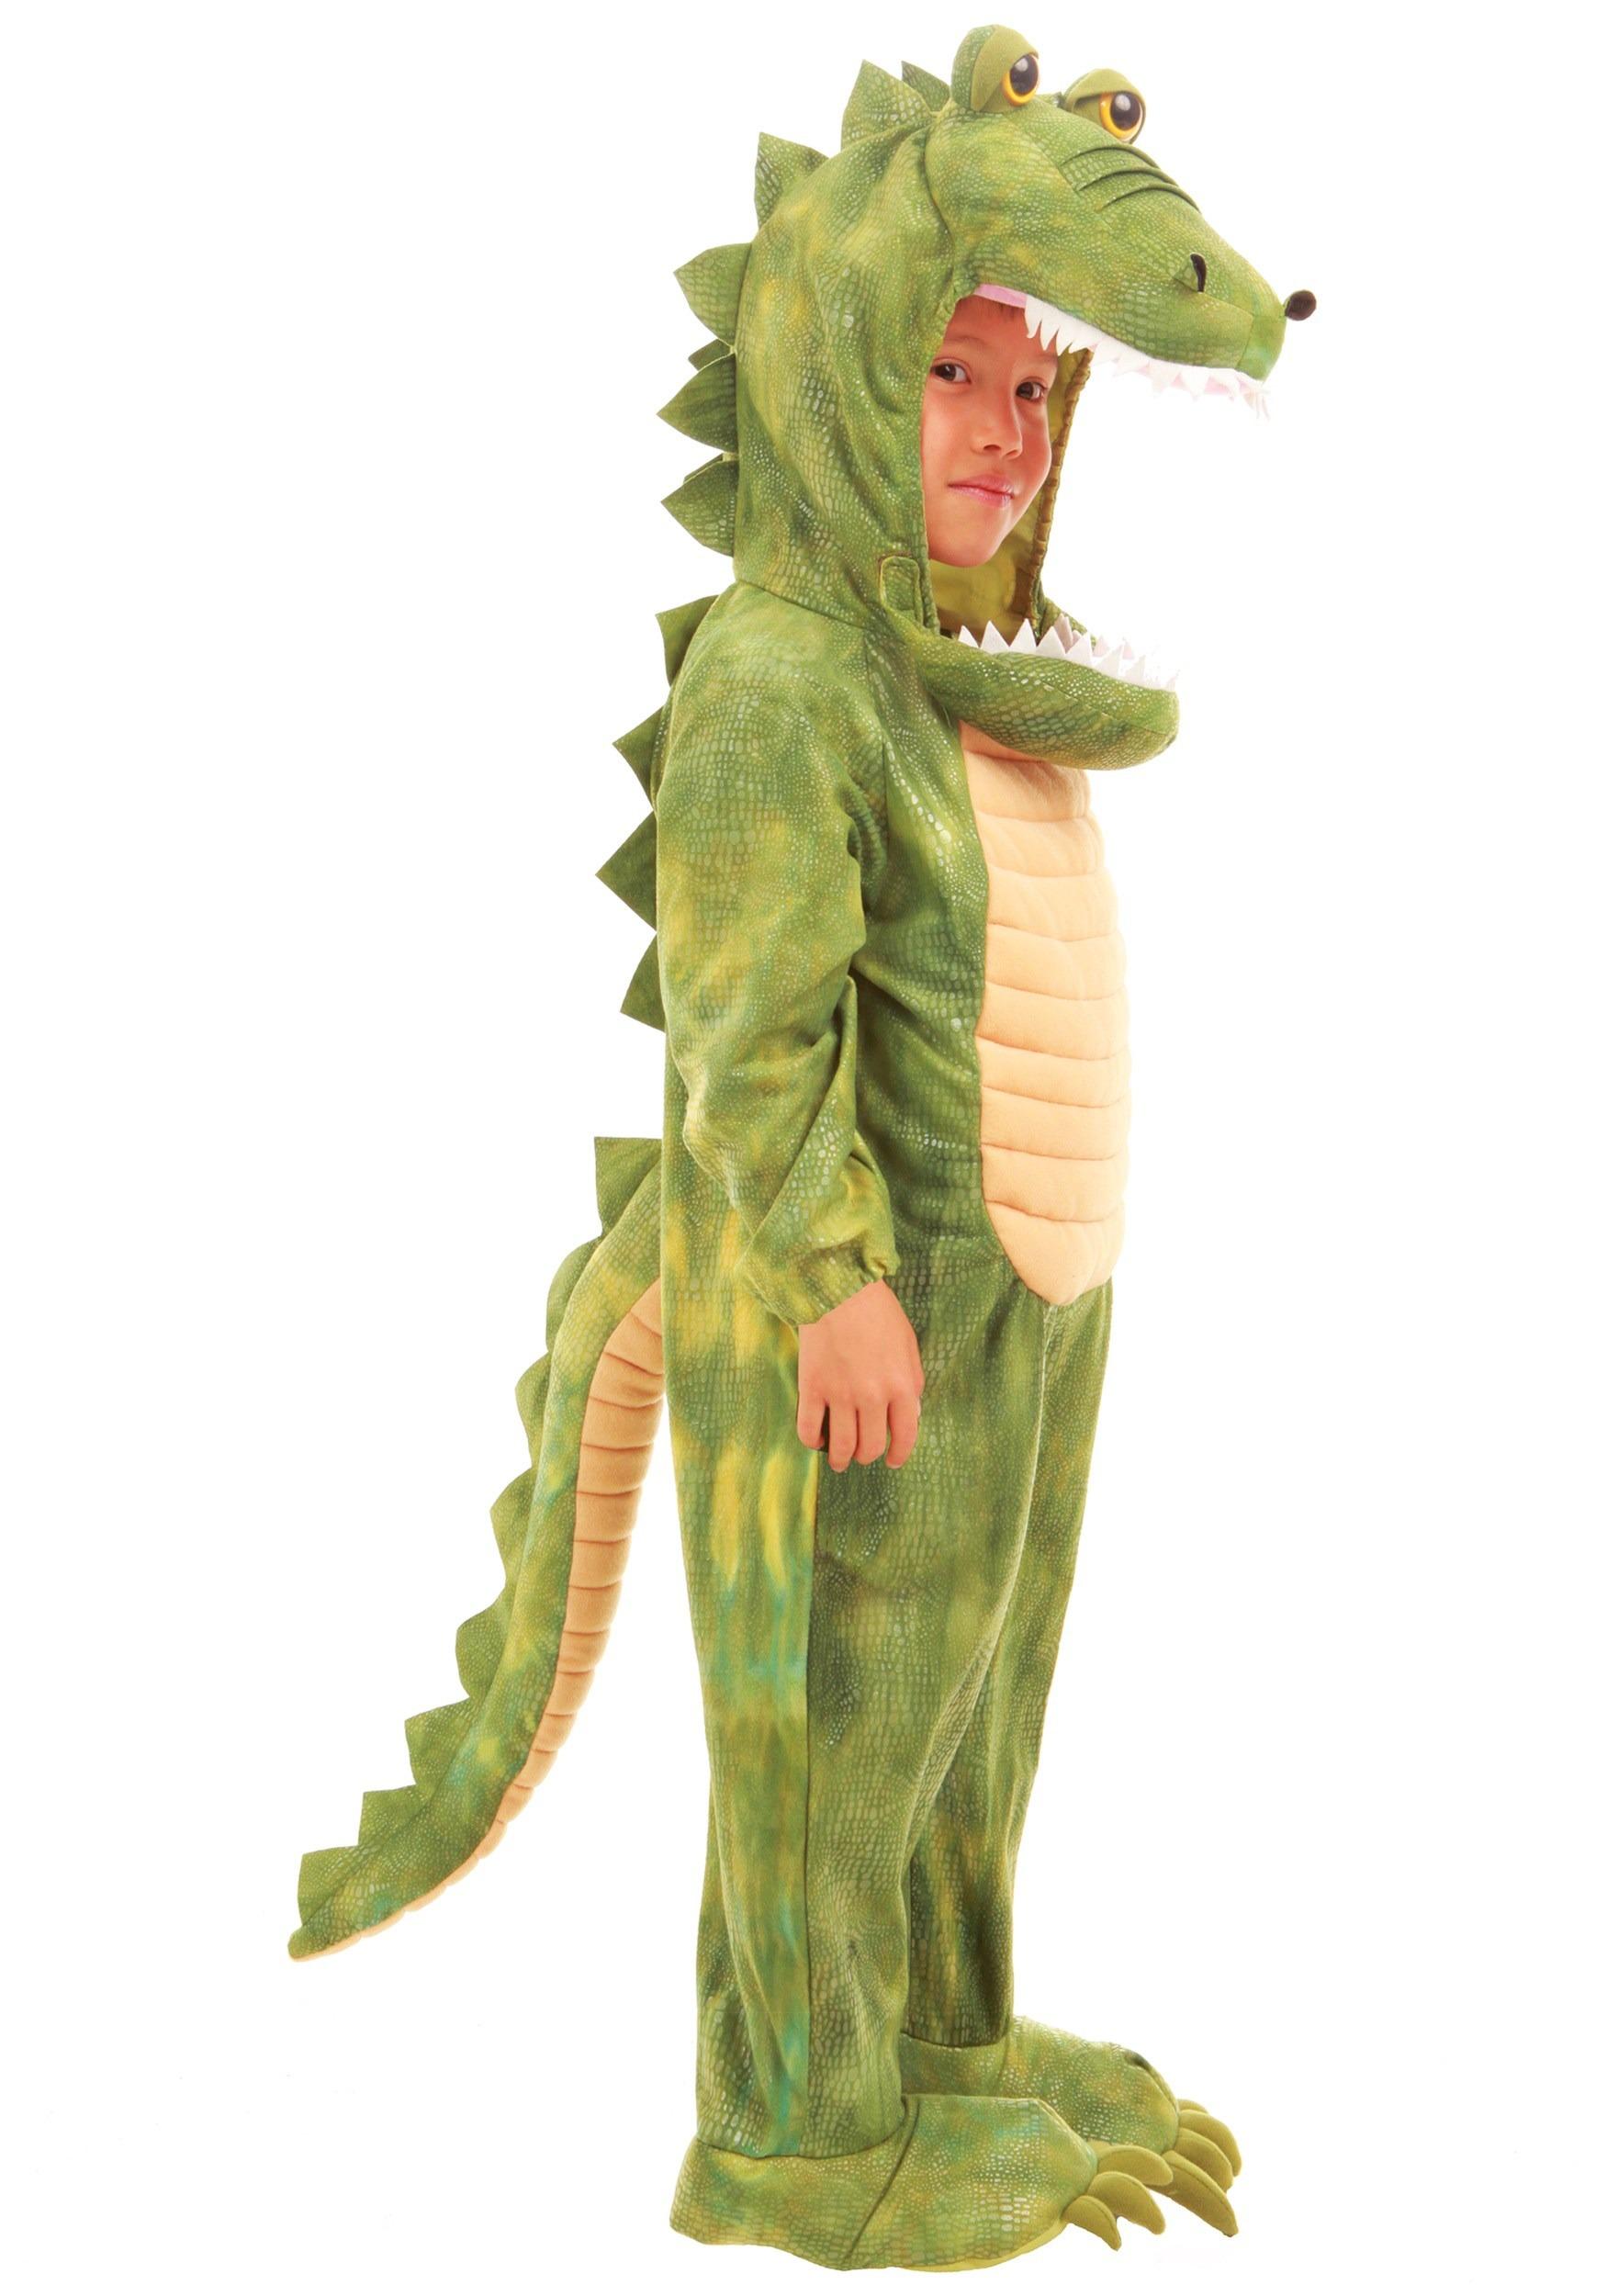 Kids Croc Costume  sc 1 st  Halloween Costume & Kids Croc Costume - Alligator Costumes Ideas for Children